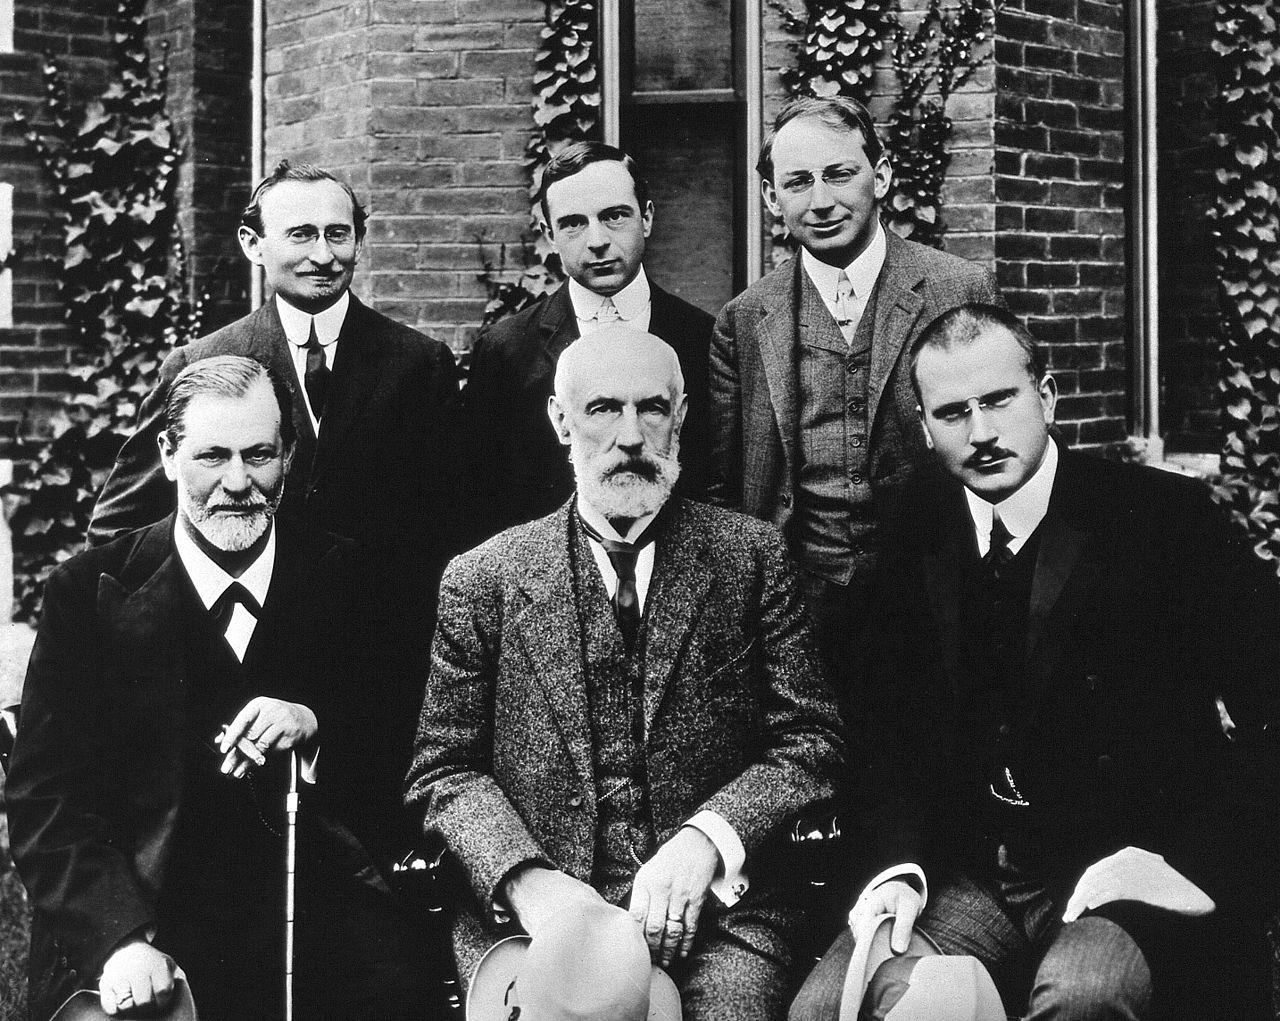 Carl Gustav Jung Wallpapers High Quality